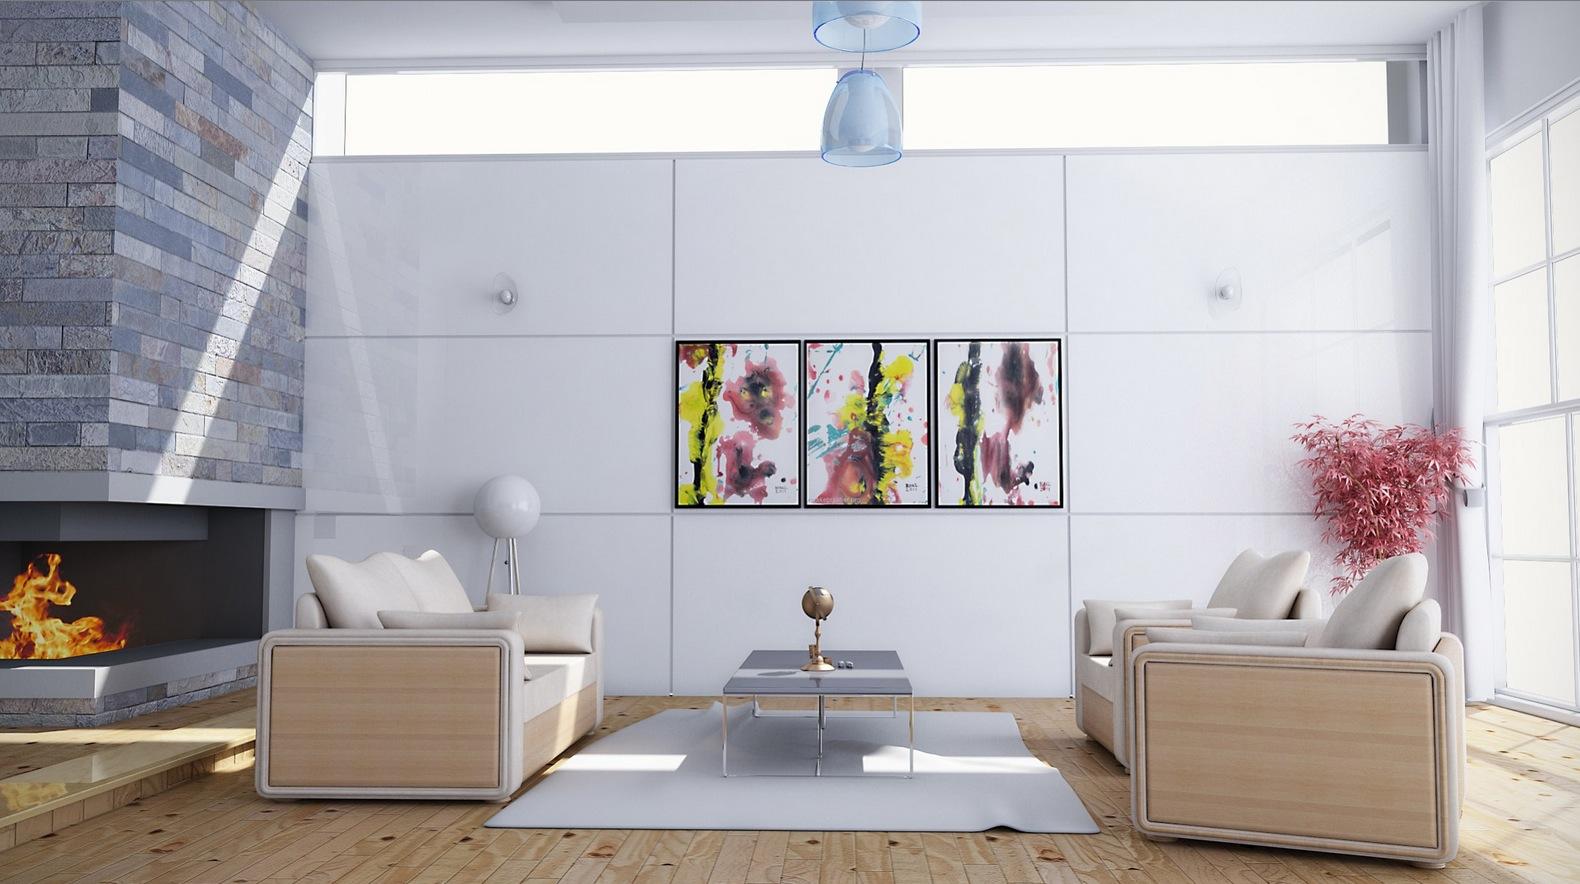 Feminine living room decor scheme interior design ideas - Feminine living room design ideas ...